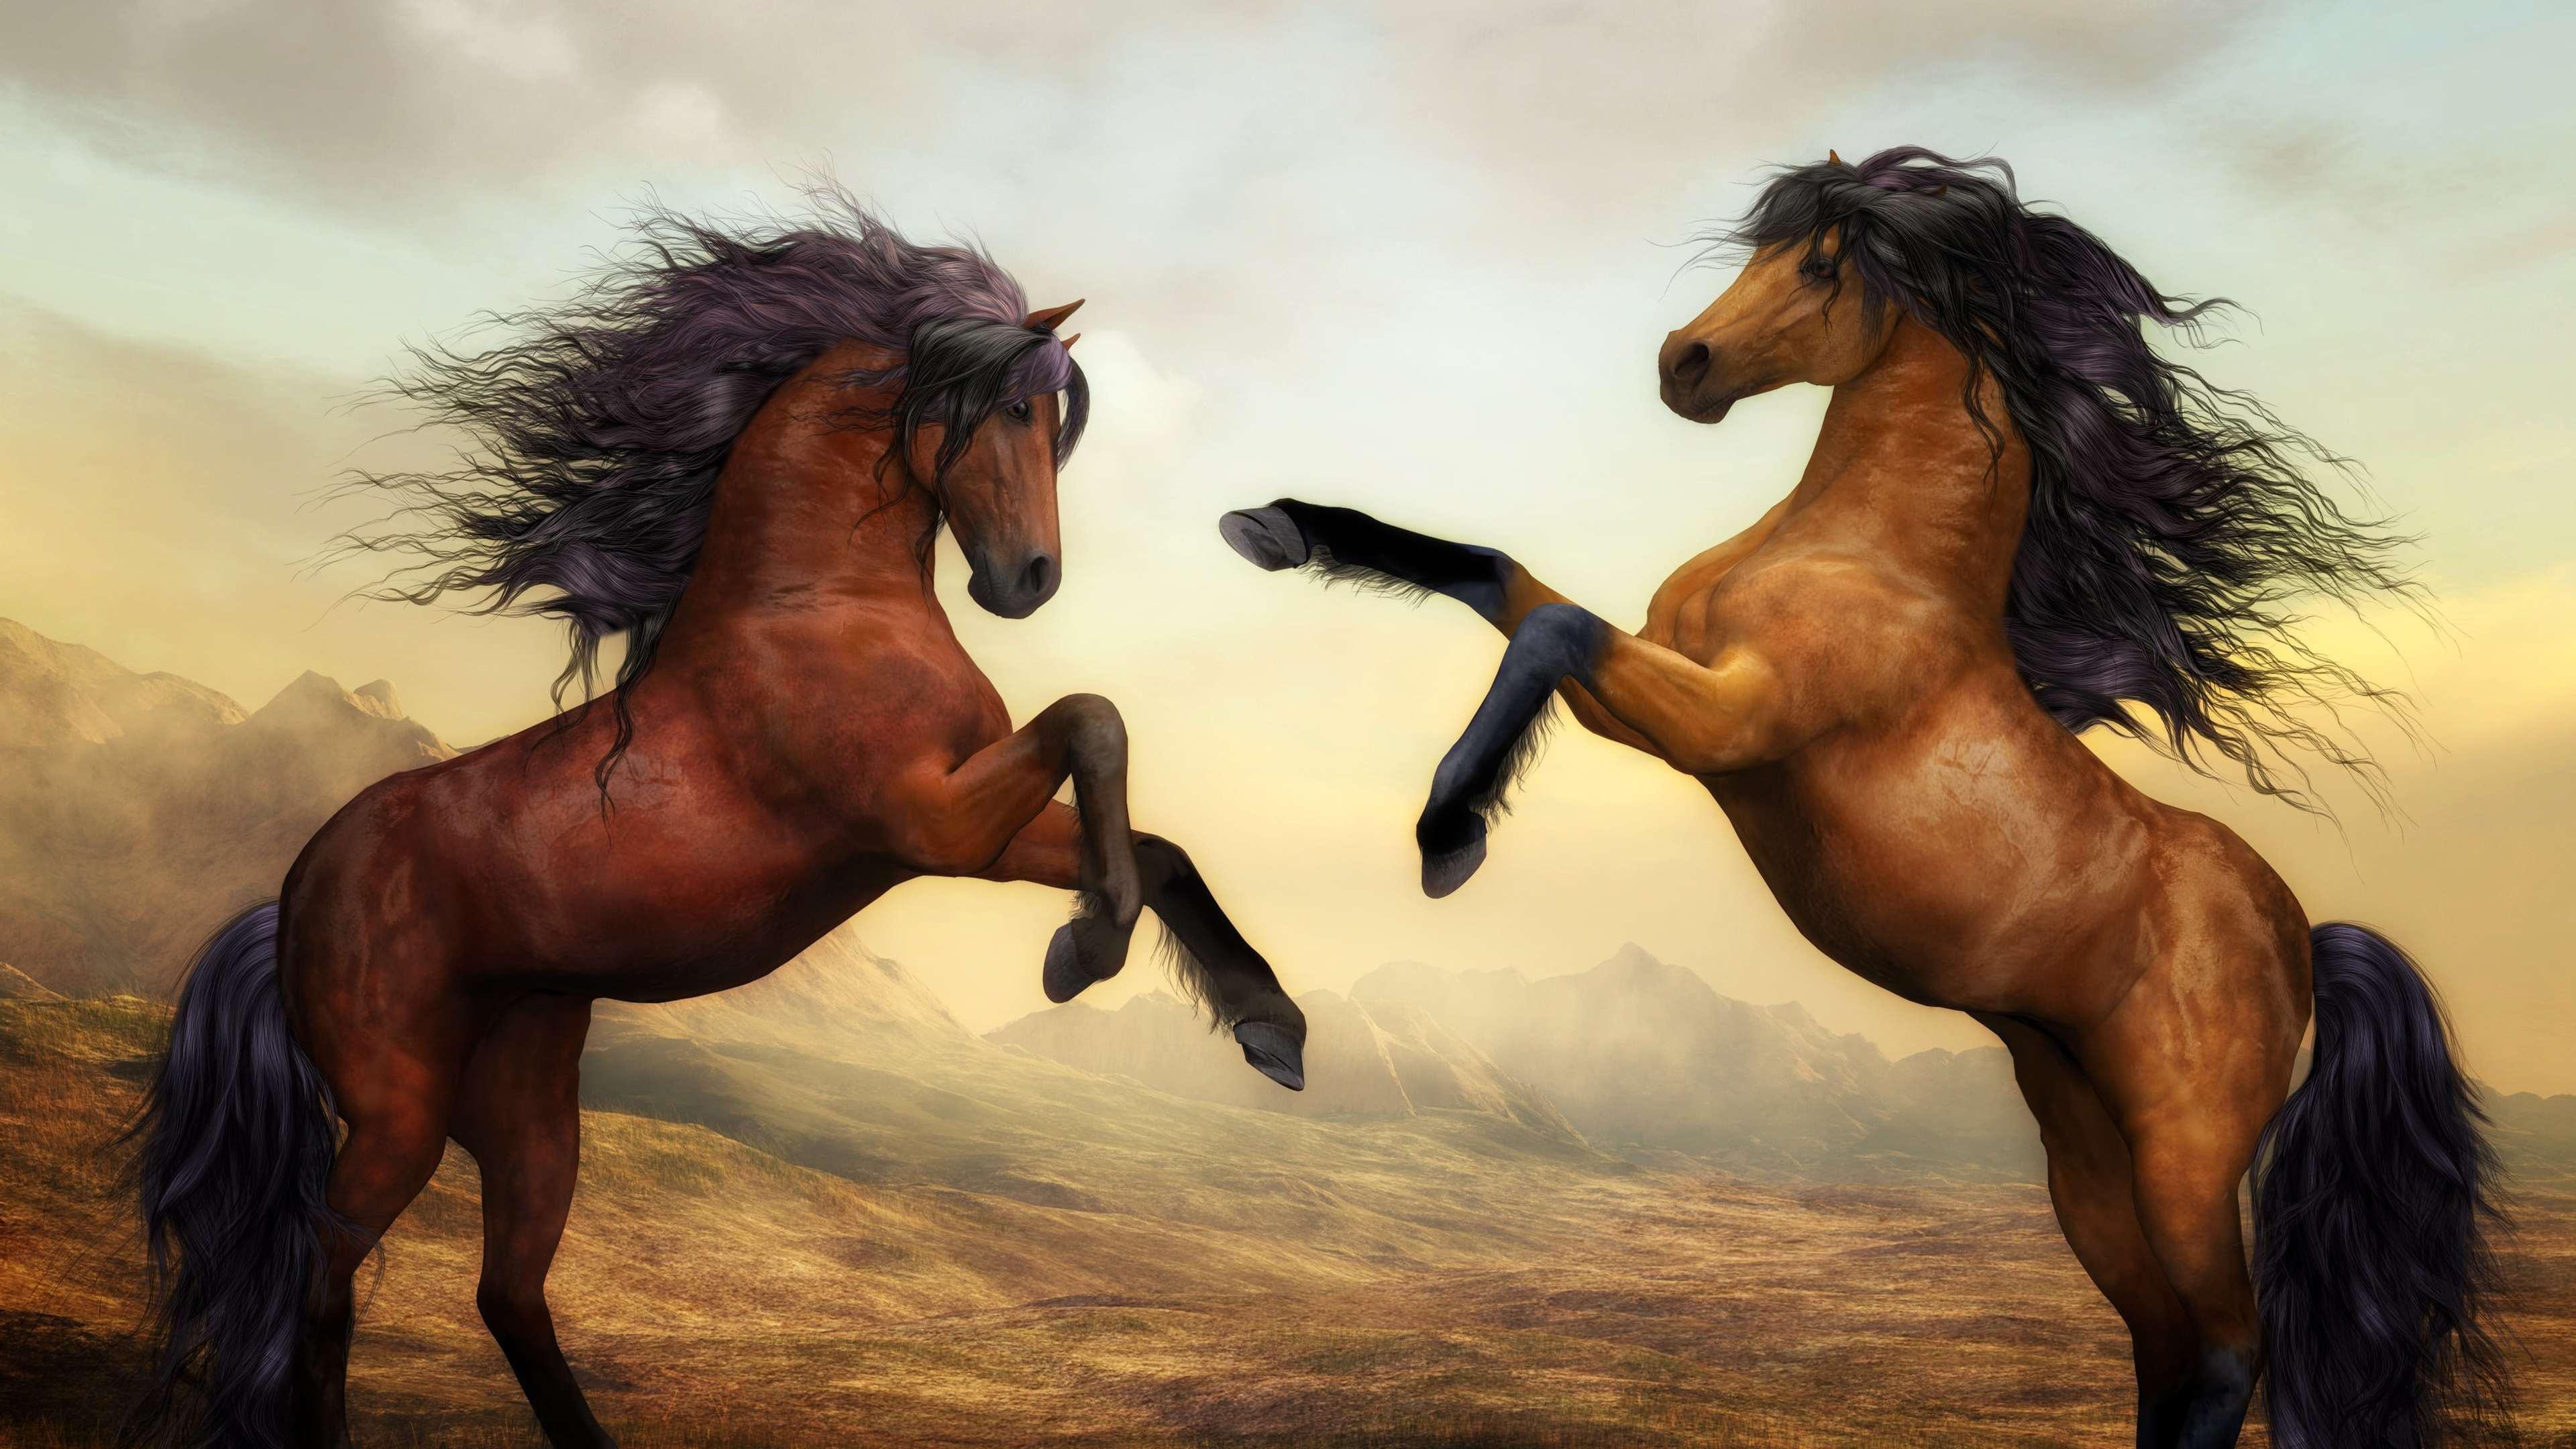 arabian horse artistic 4k 1540751152 - Arabian Horse Artistic 4k - horse wallpapers, hd-wallpapers, digital art wallpapers, artwork wallpapers, 4k-wallpapers